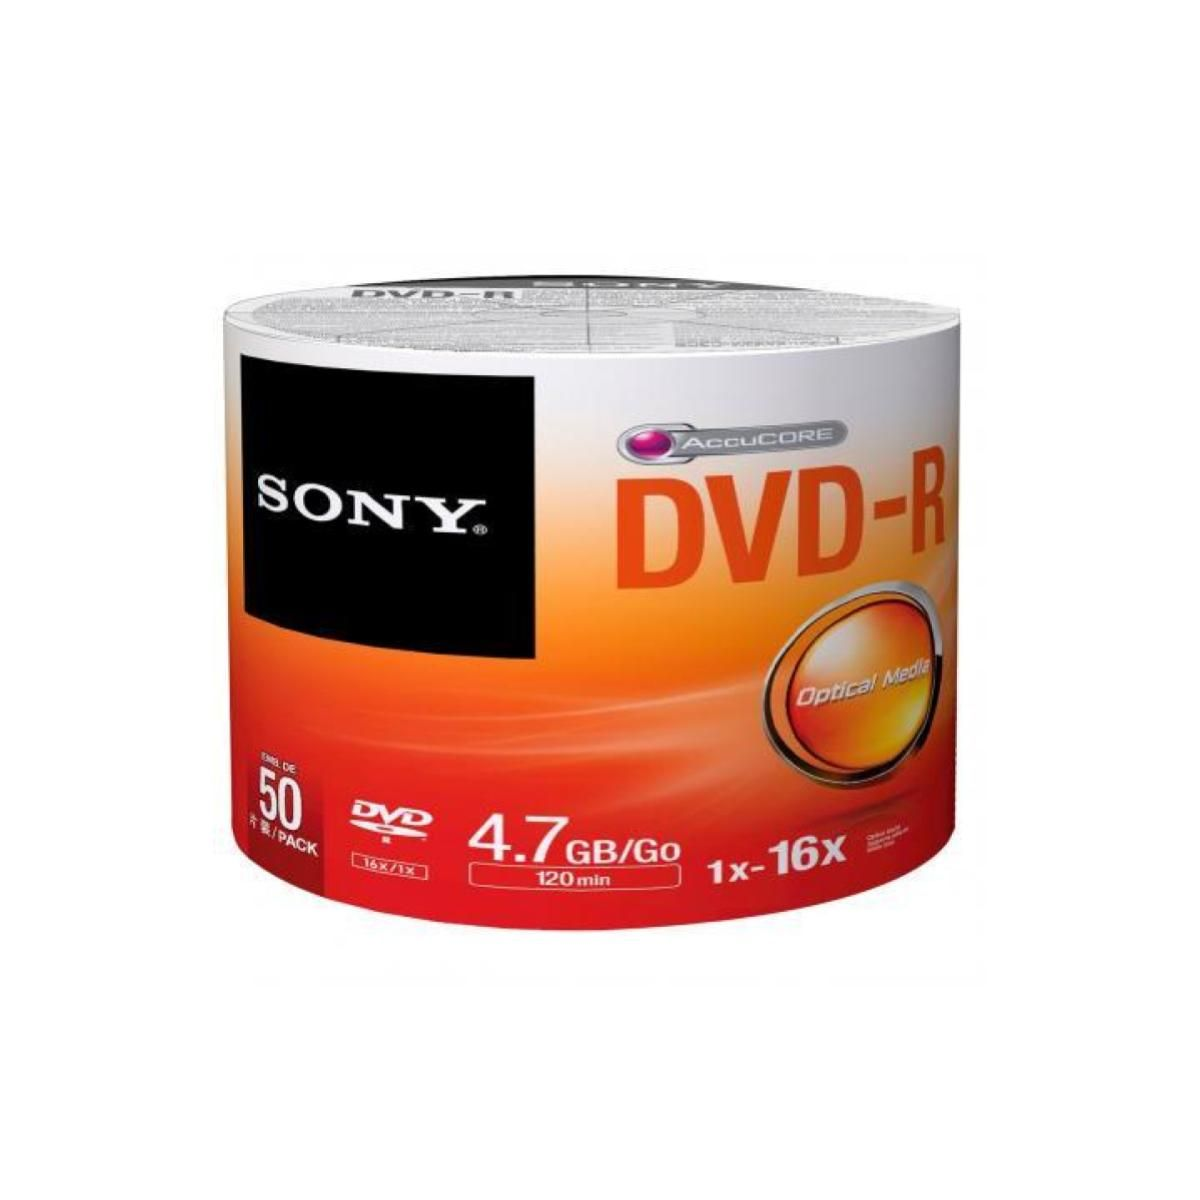 CD-DVD-R 4.7GB 16x 120 Minutos Sony